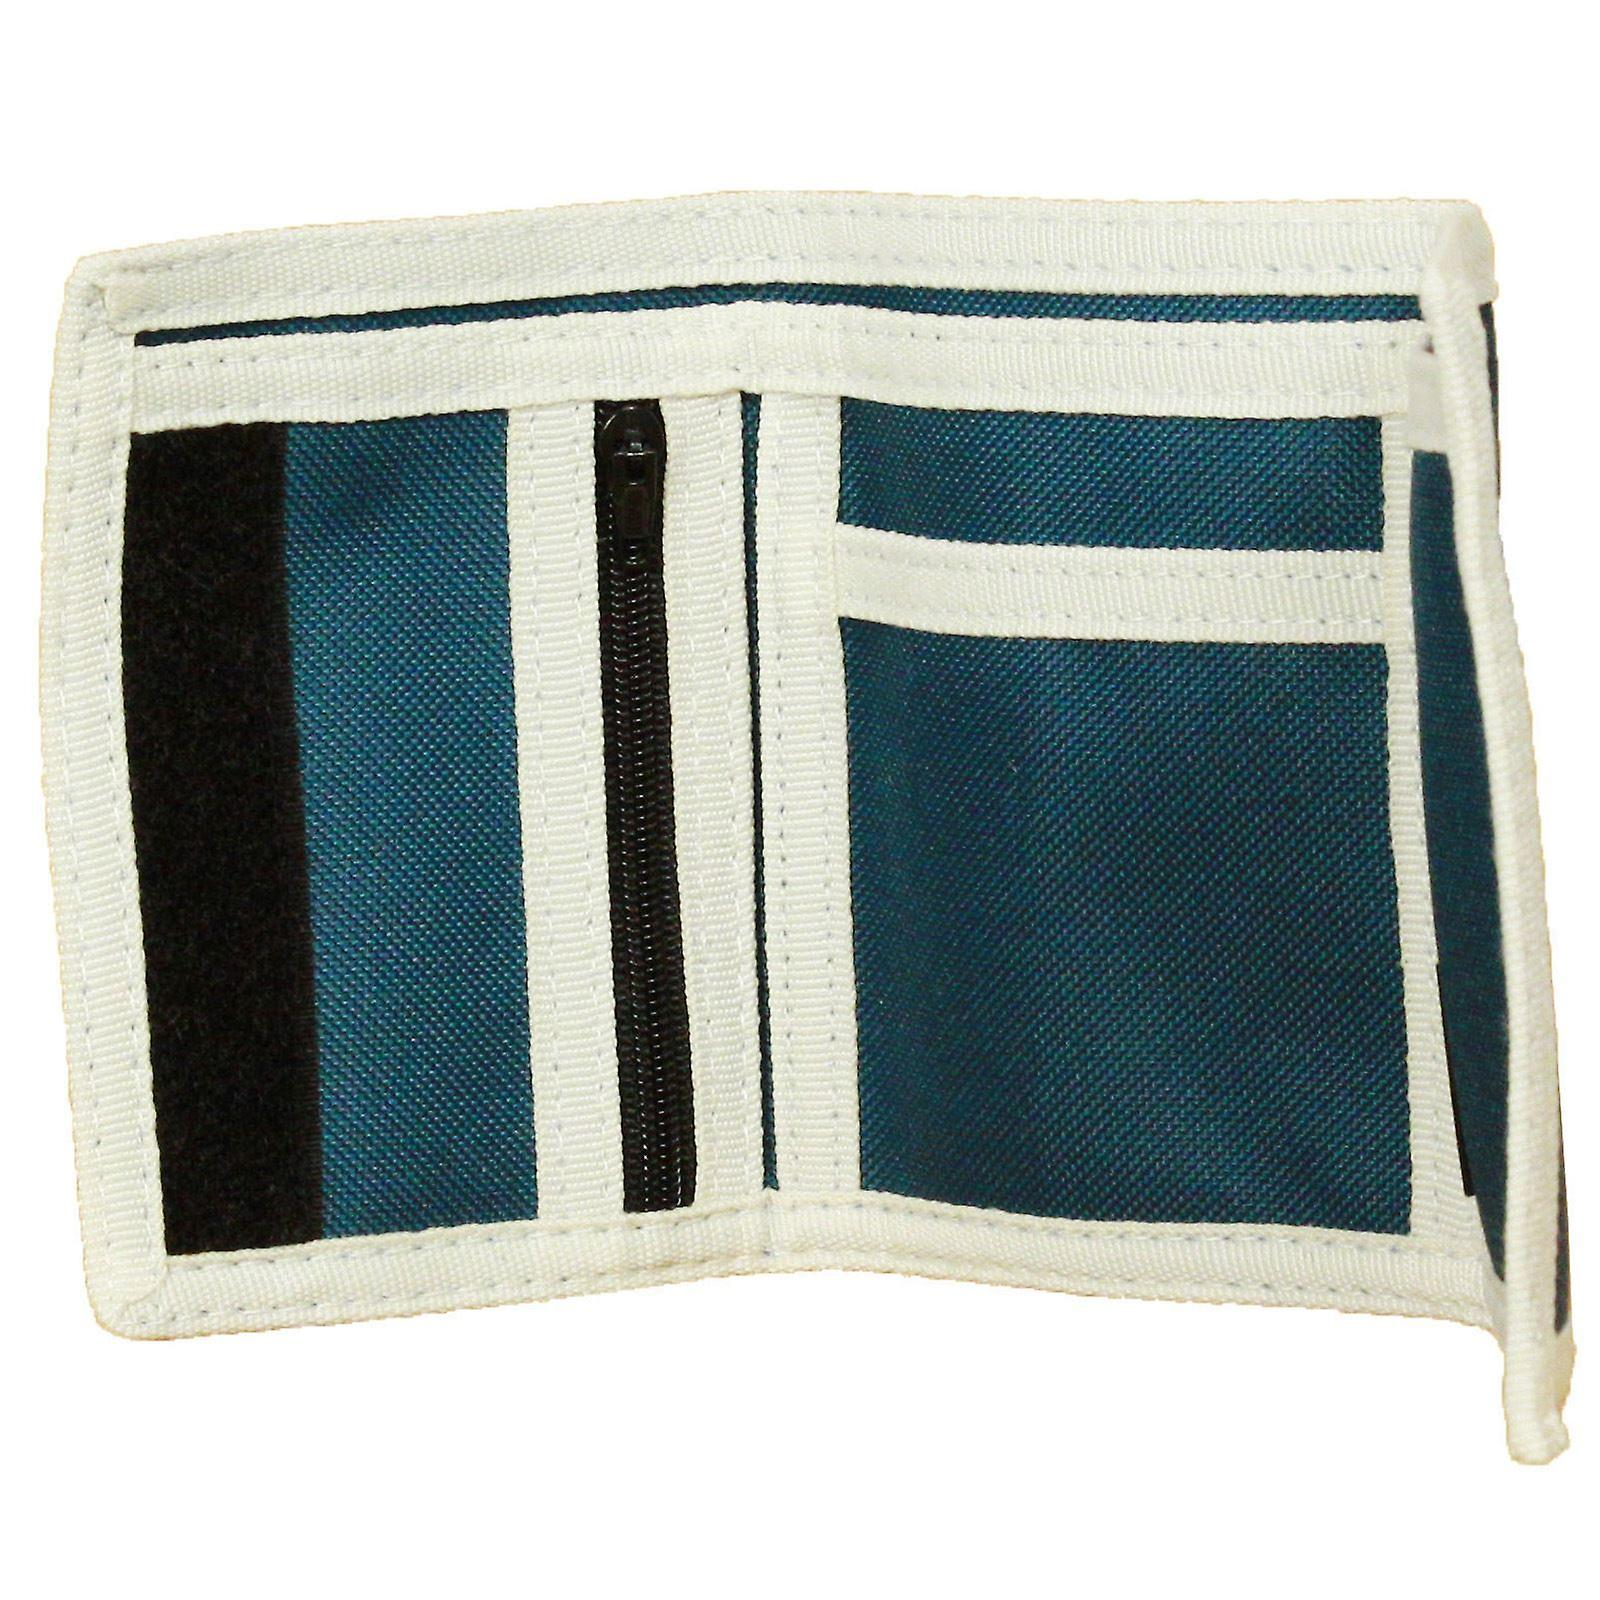 Element driebladige portemonnee met de binnenzakken en Zipped munt sectie ~ Elemental Marokkaanse blauw